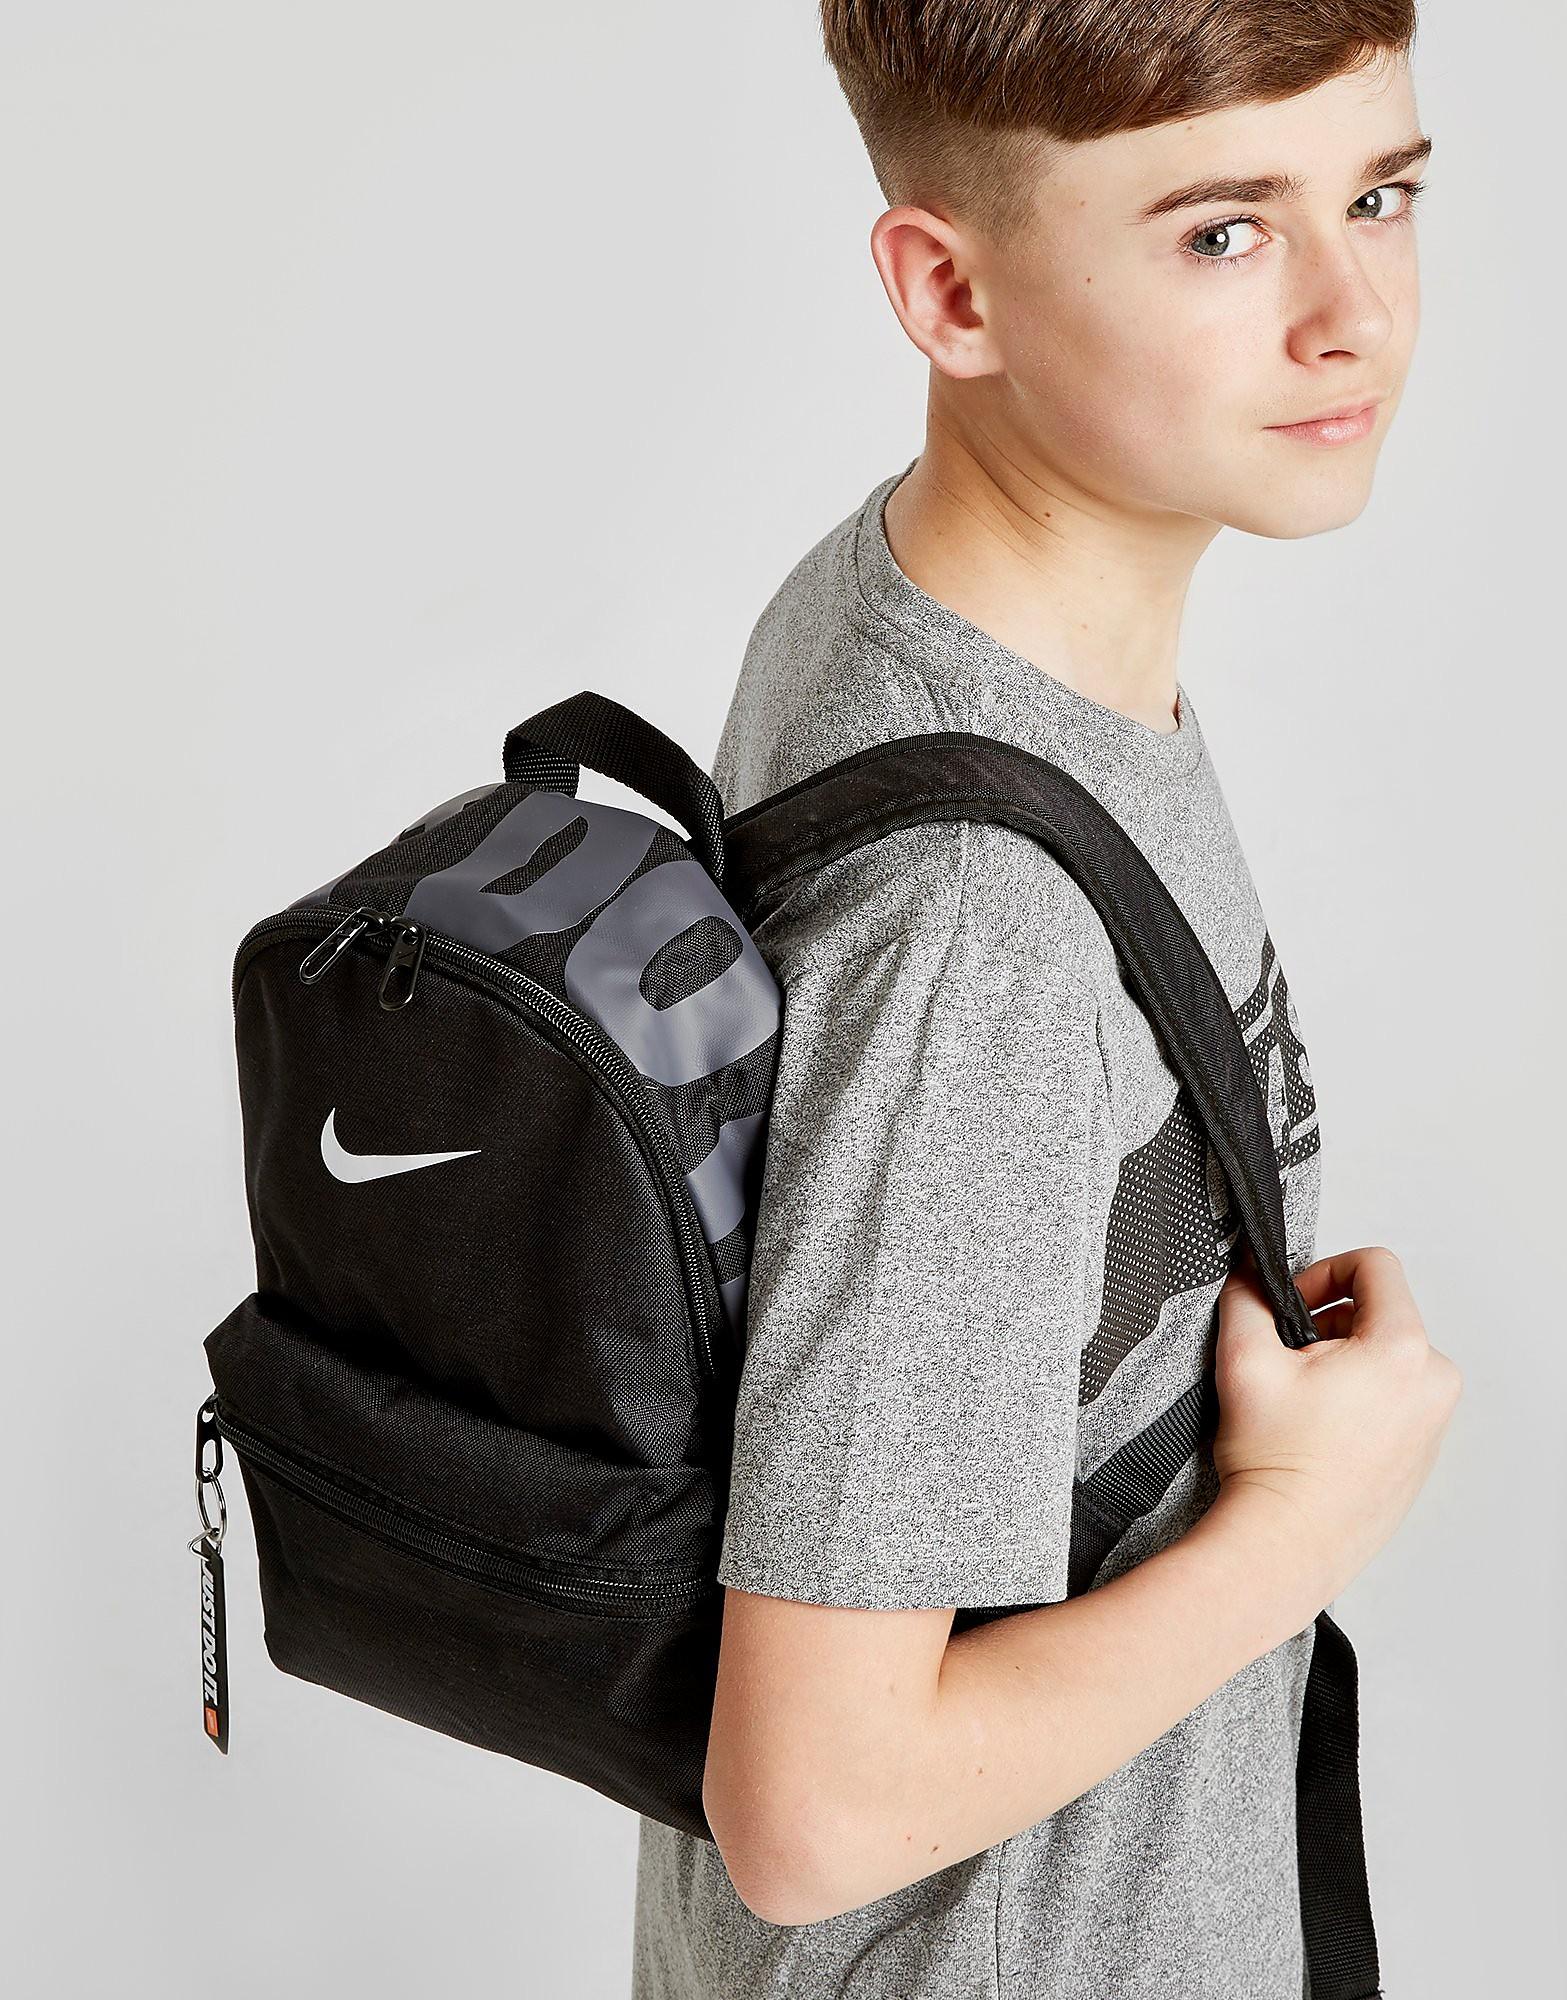 Nike Sac à Dos Mini Just Do It